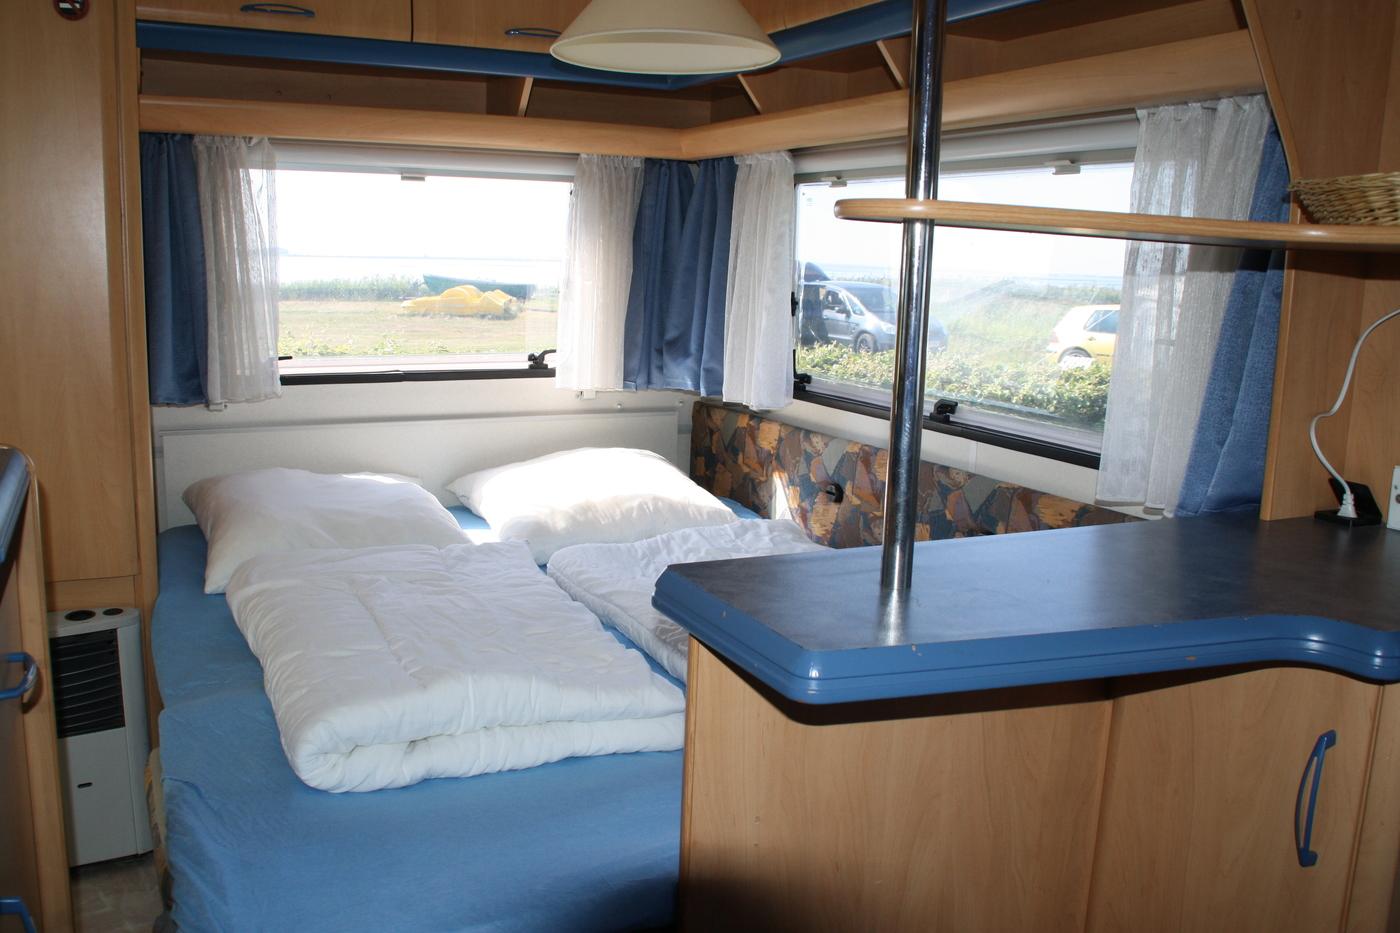 Thumb opredning campingvogne udlejning nordjylland